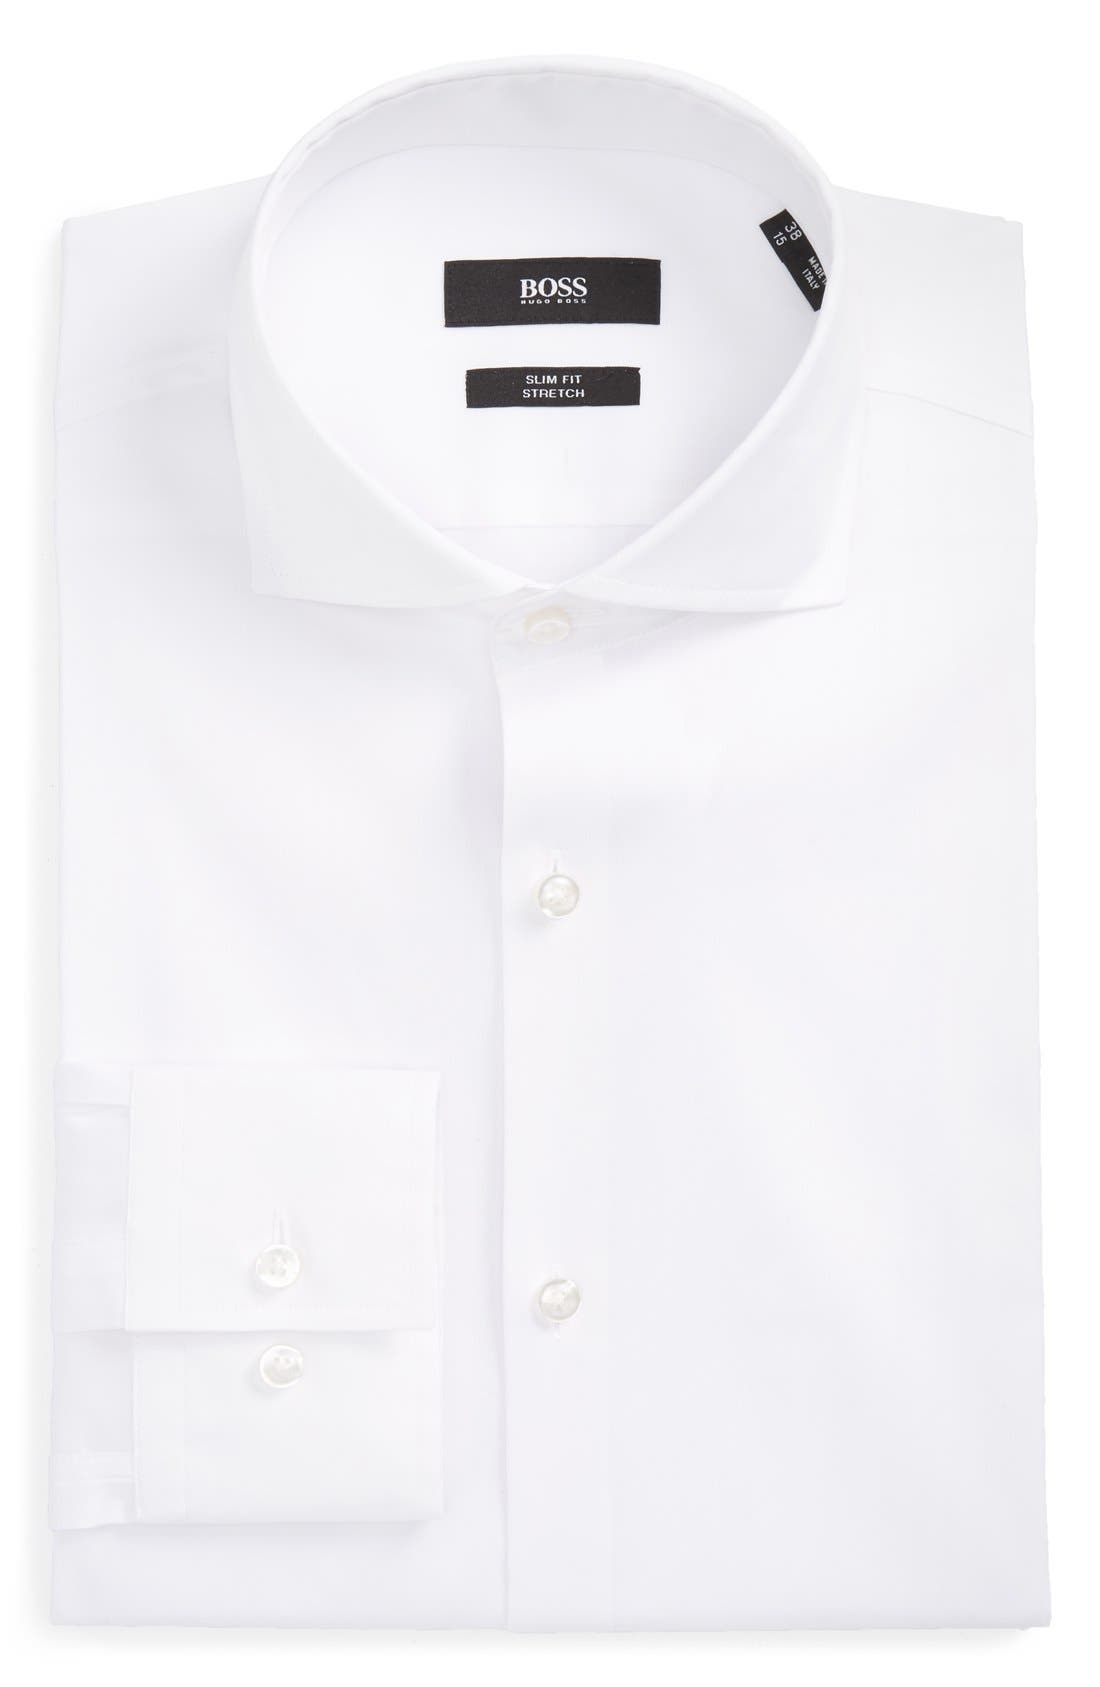 Main Image - BOSS 'Jason' Slim Fit Solid Stretch Dress Shirt